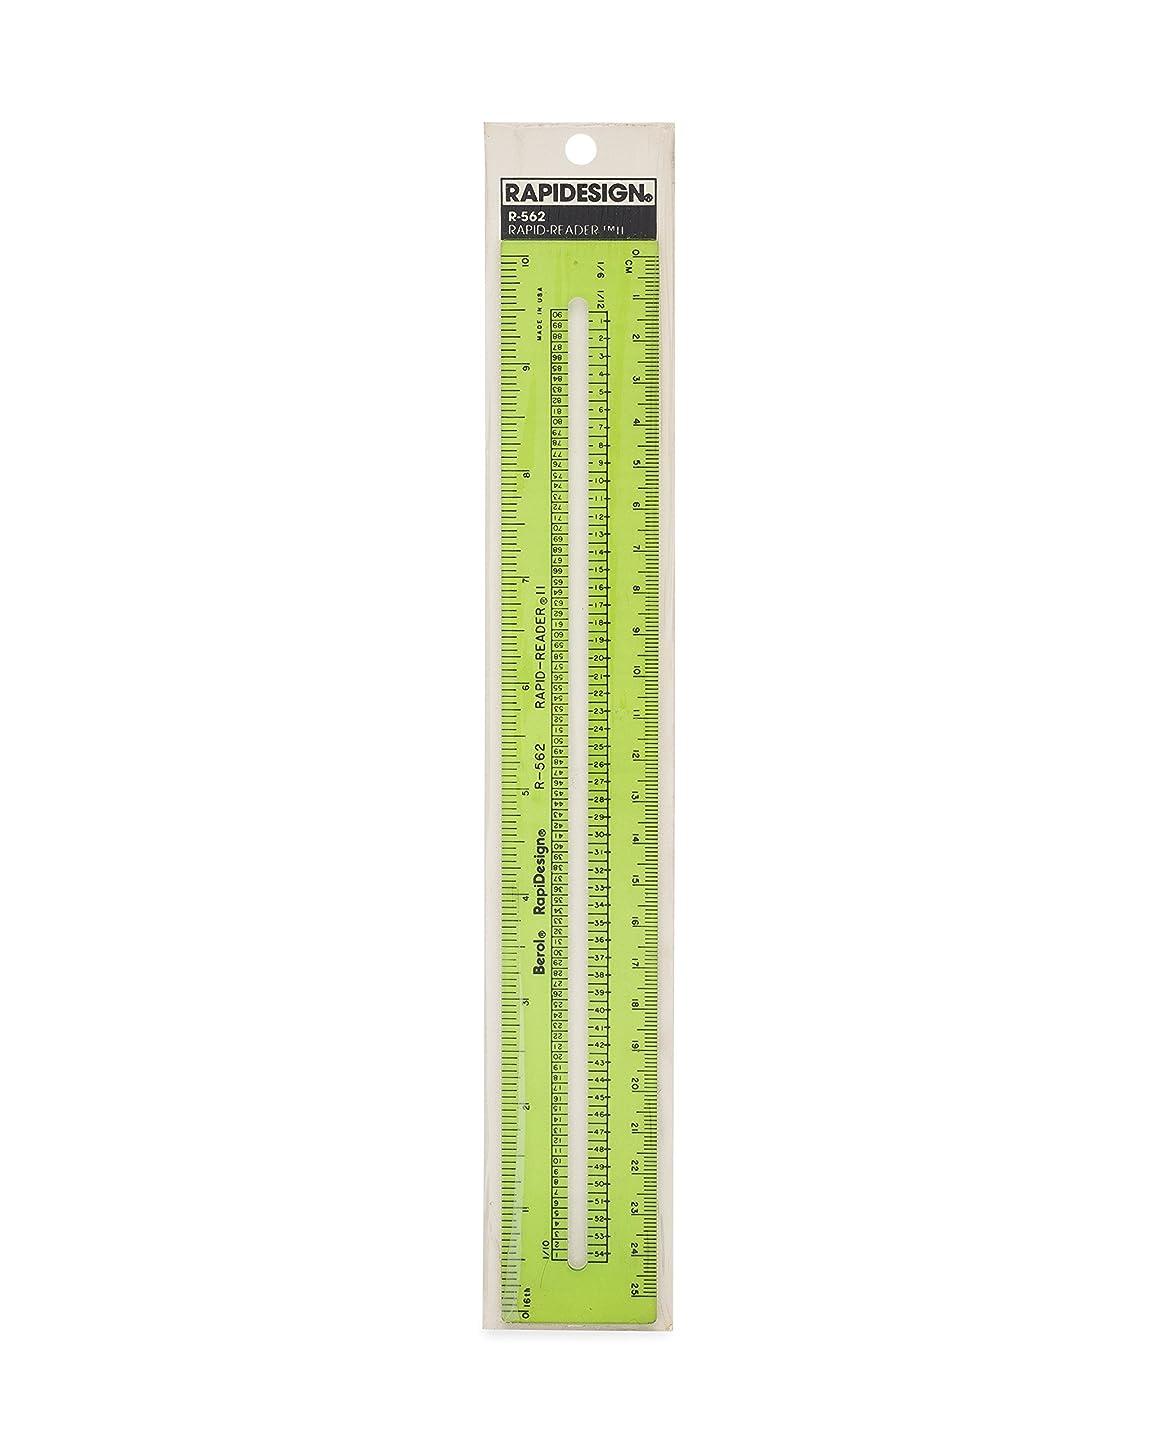 Rapidesign Rapid-Reader II Ruler, 1 Each (R562)